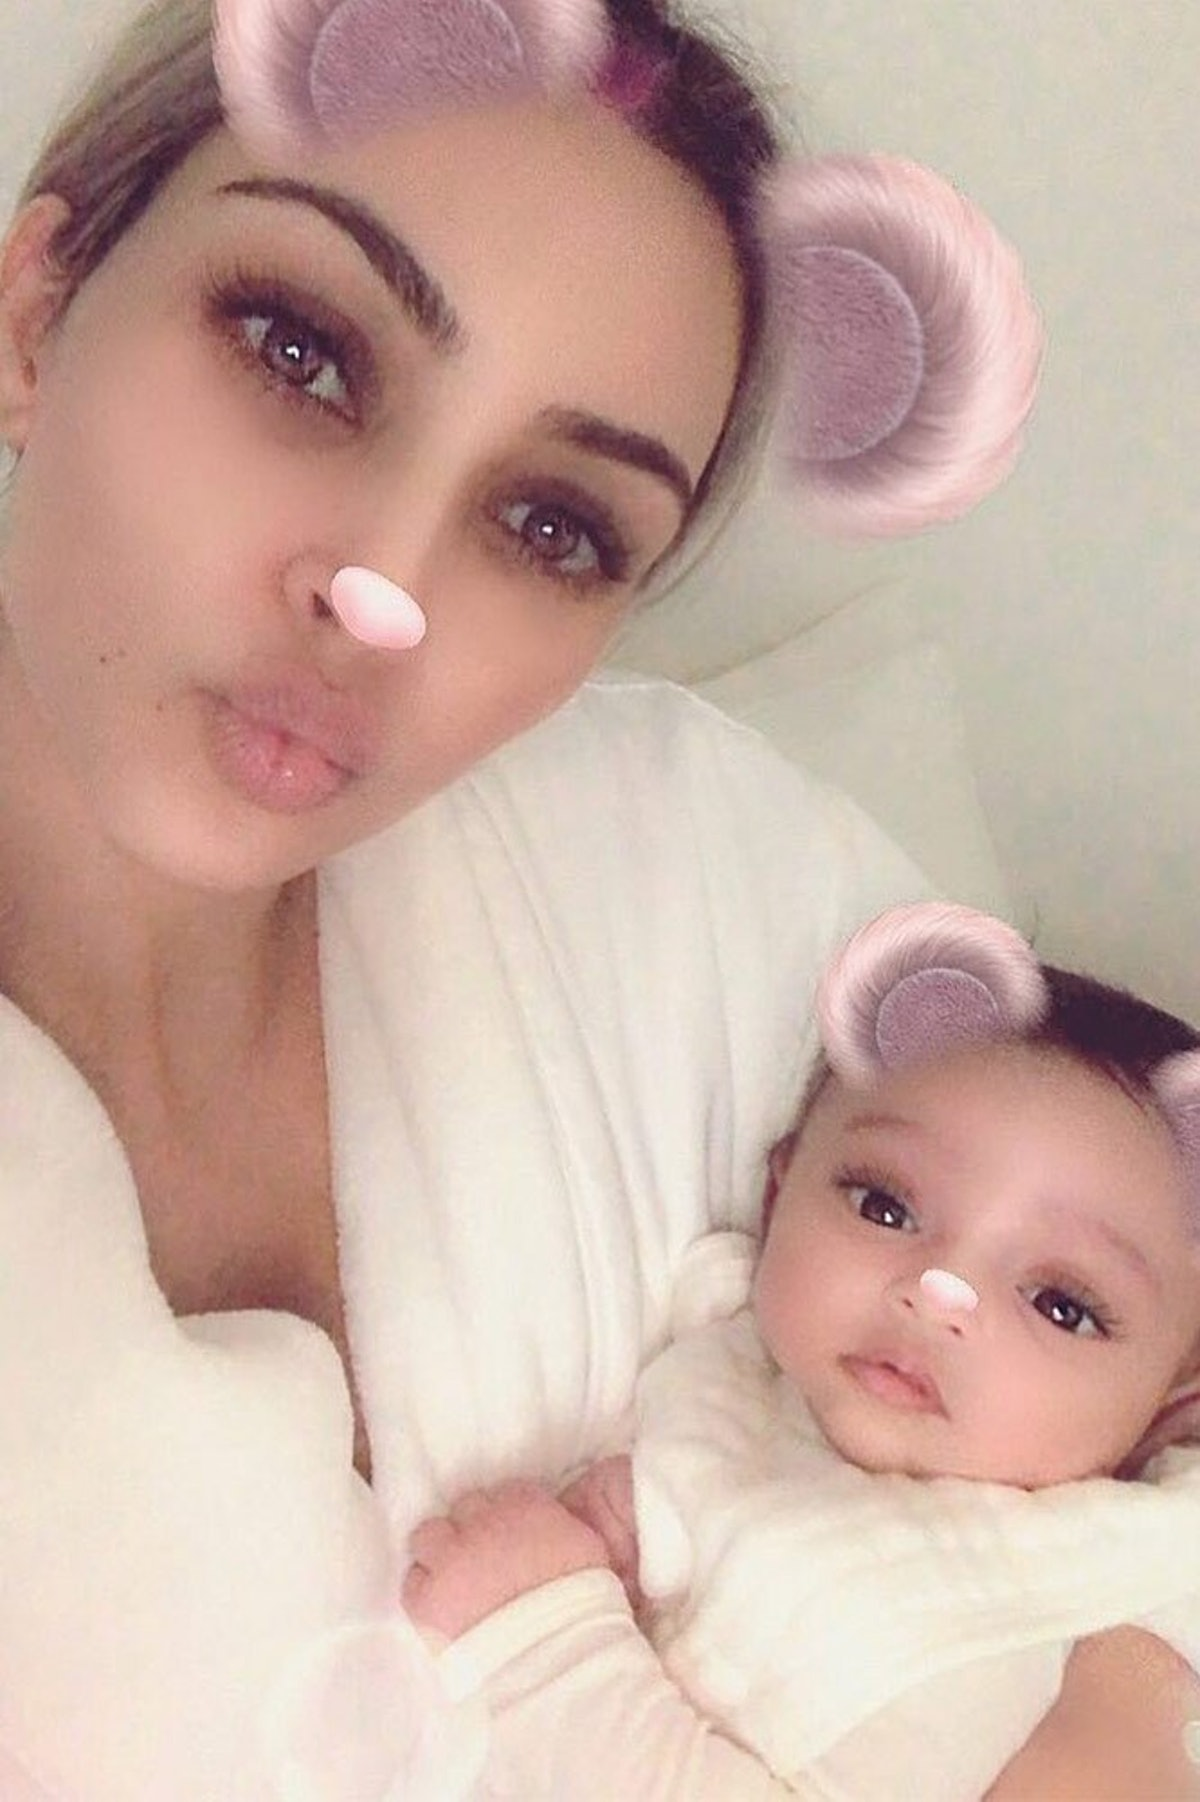 Snapchat/Kim Kardashian